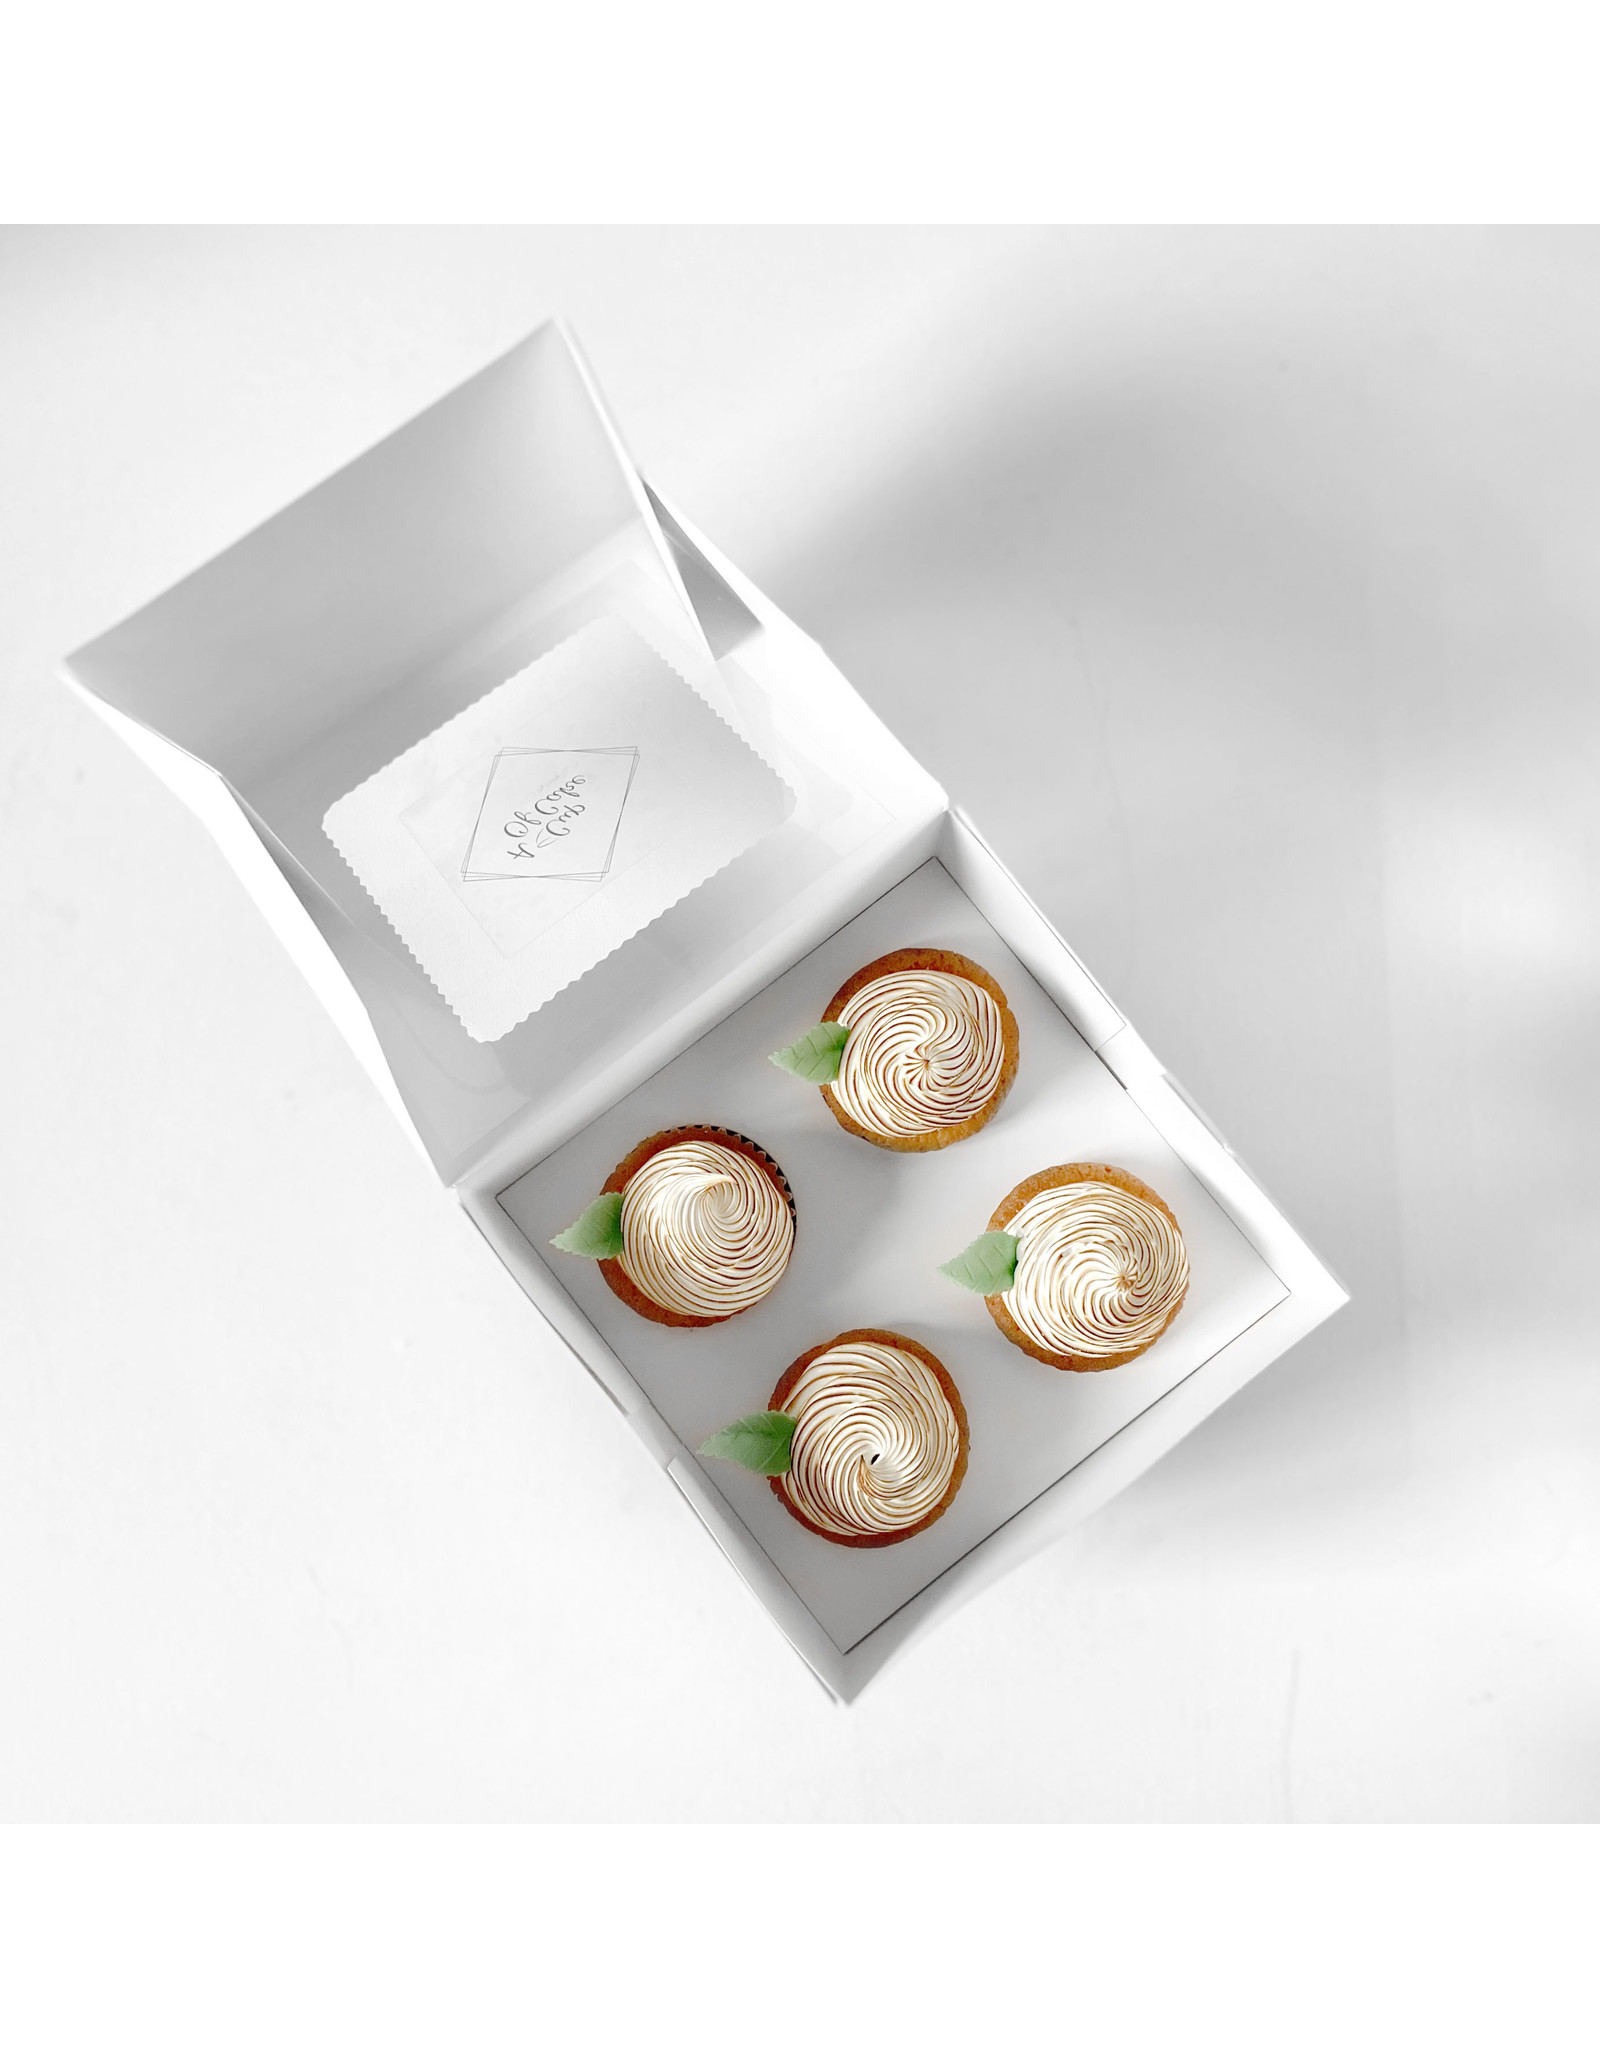 Economy box for 4 cupcakes (per 10 pieces)